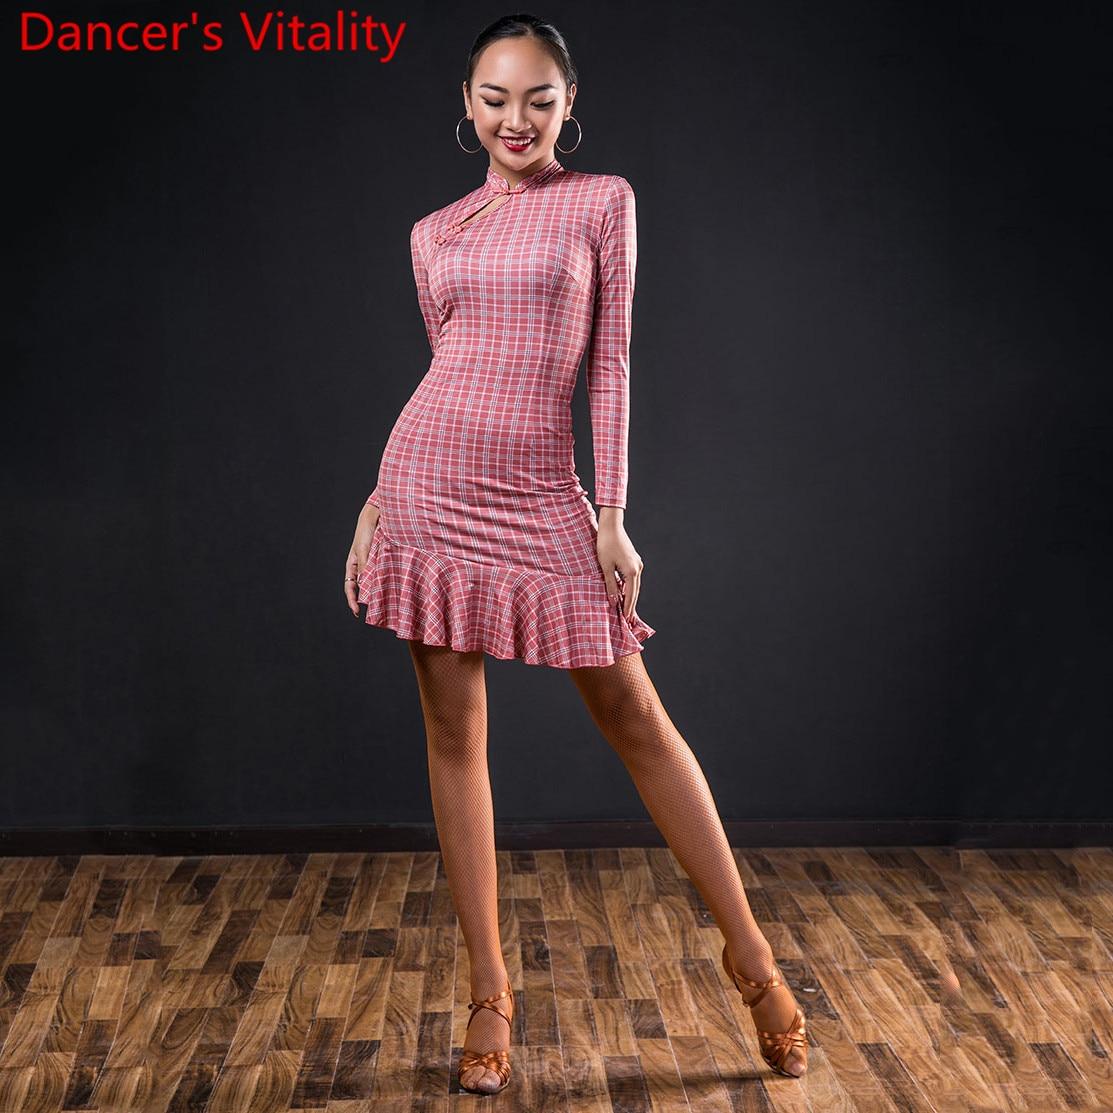 Latin Dance Performance Clothes Women Adults Fashion Long Sleeve Dress National Standard Rumba Samba Tango Dancing Training Suit